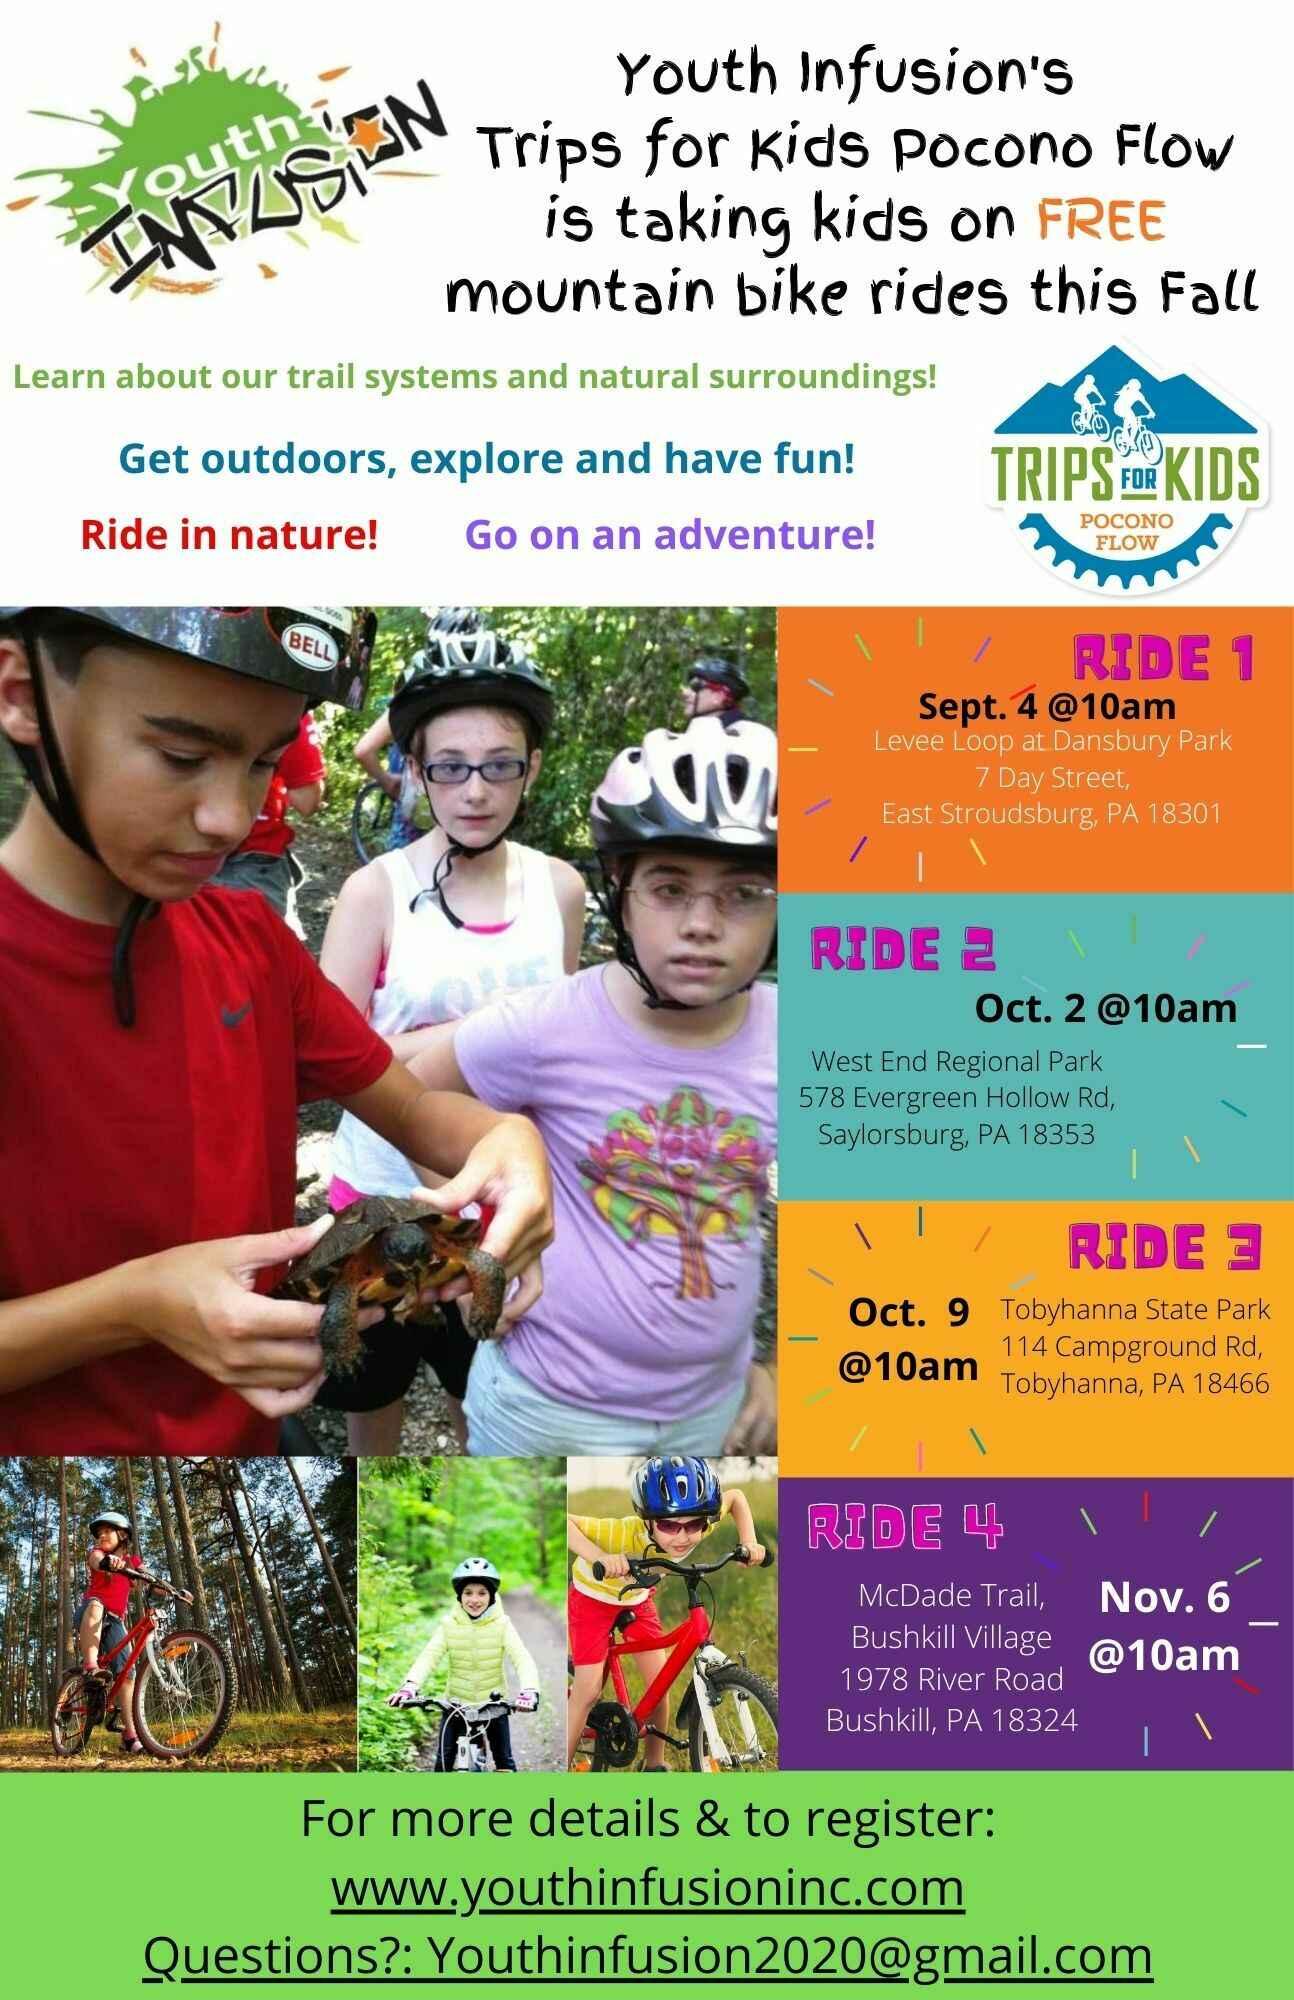 FREE Trips for Kids Pocono Flow Ride - Saturday, November 6, 2021 image